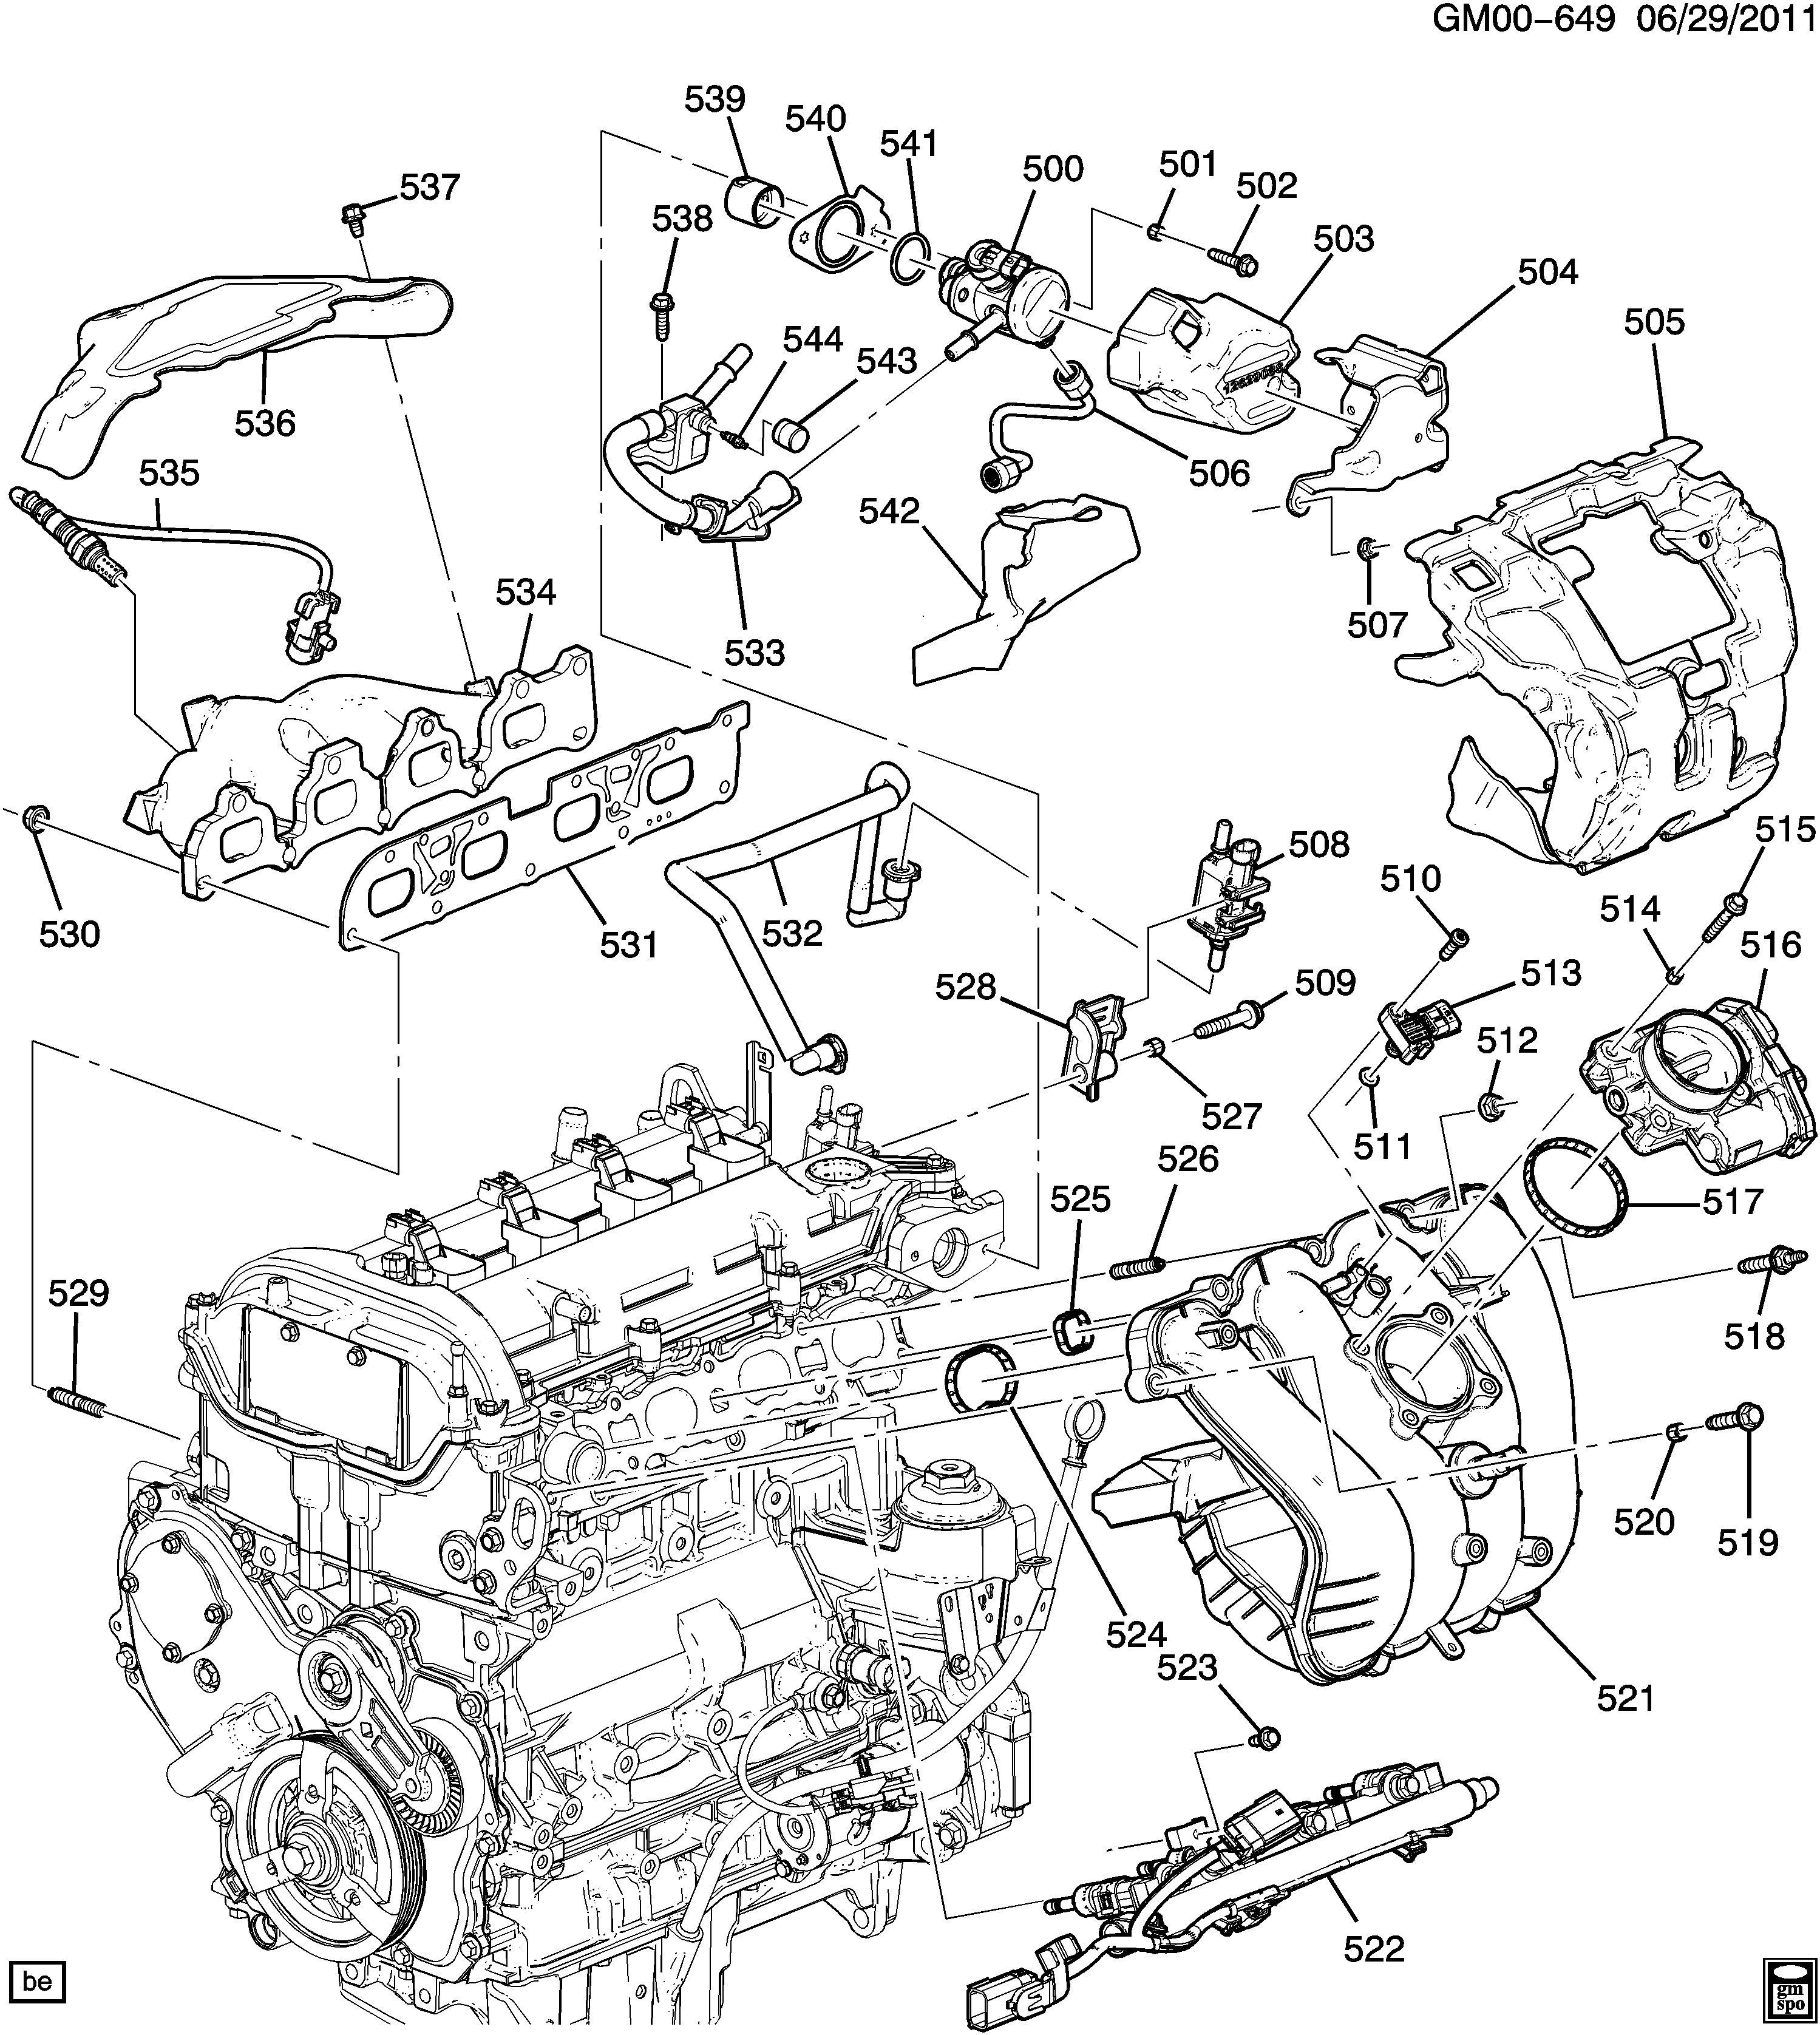 [SCHEMATICS_43NM]  FE_8646] Chevy Tahoe Tailgate Parts Diagram Free Diagram | 2010 Chevy Equinox Wiring Diagram |  | Lexor Rimen Wigeg Mohammedshrine Librar Wiring 101